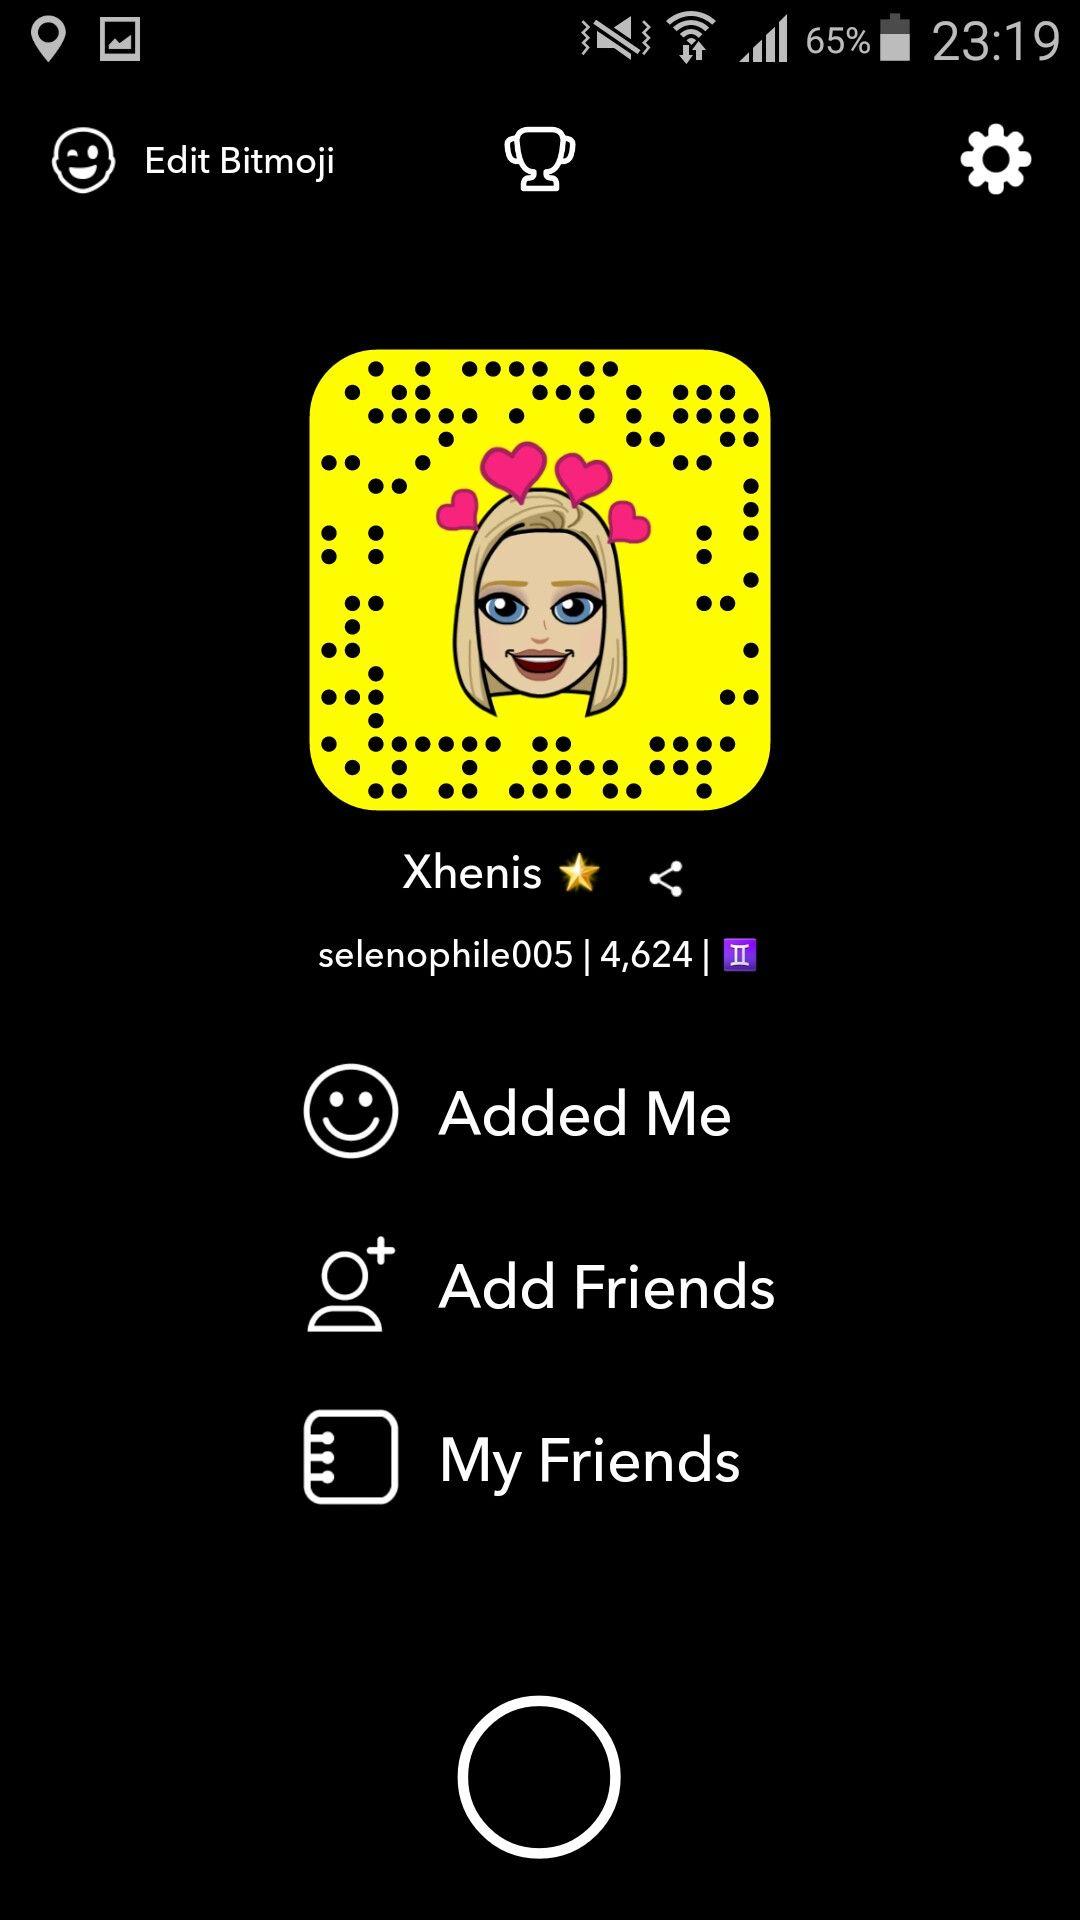 Snapchat Add Me Snapcode Snapchat Usernames Celebrity Snapchats Snapchat Accounts To Follow